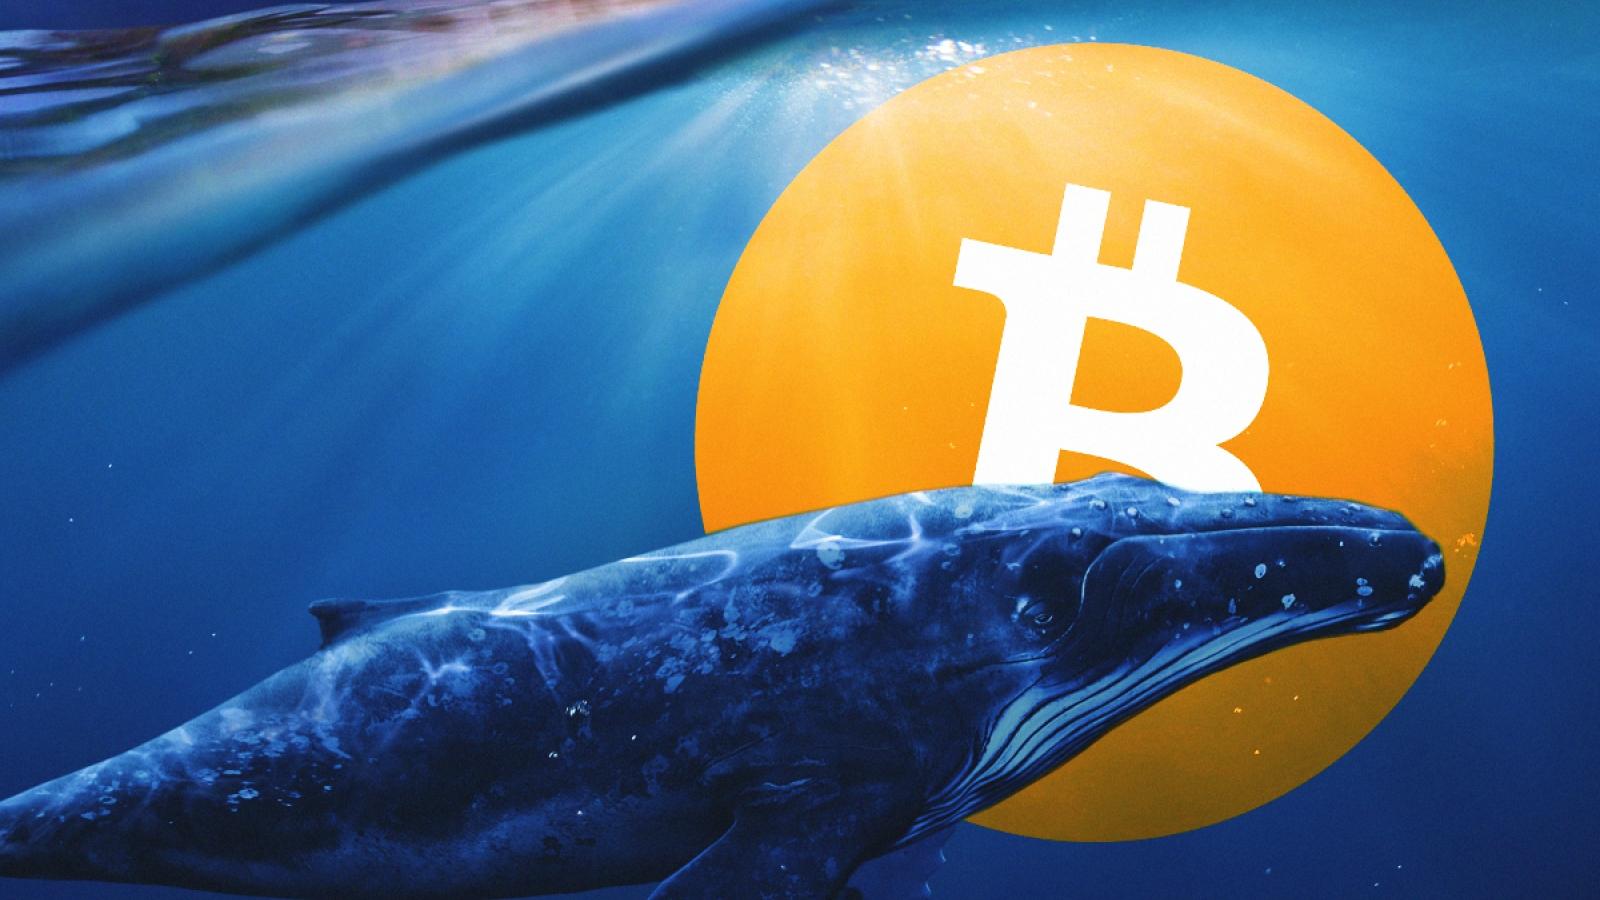 balinalar bitcoin lerini btc nakite ceviriyor